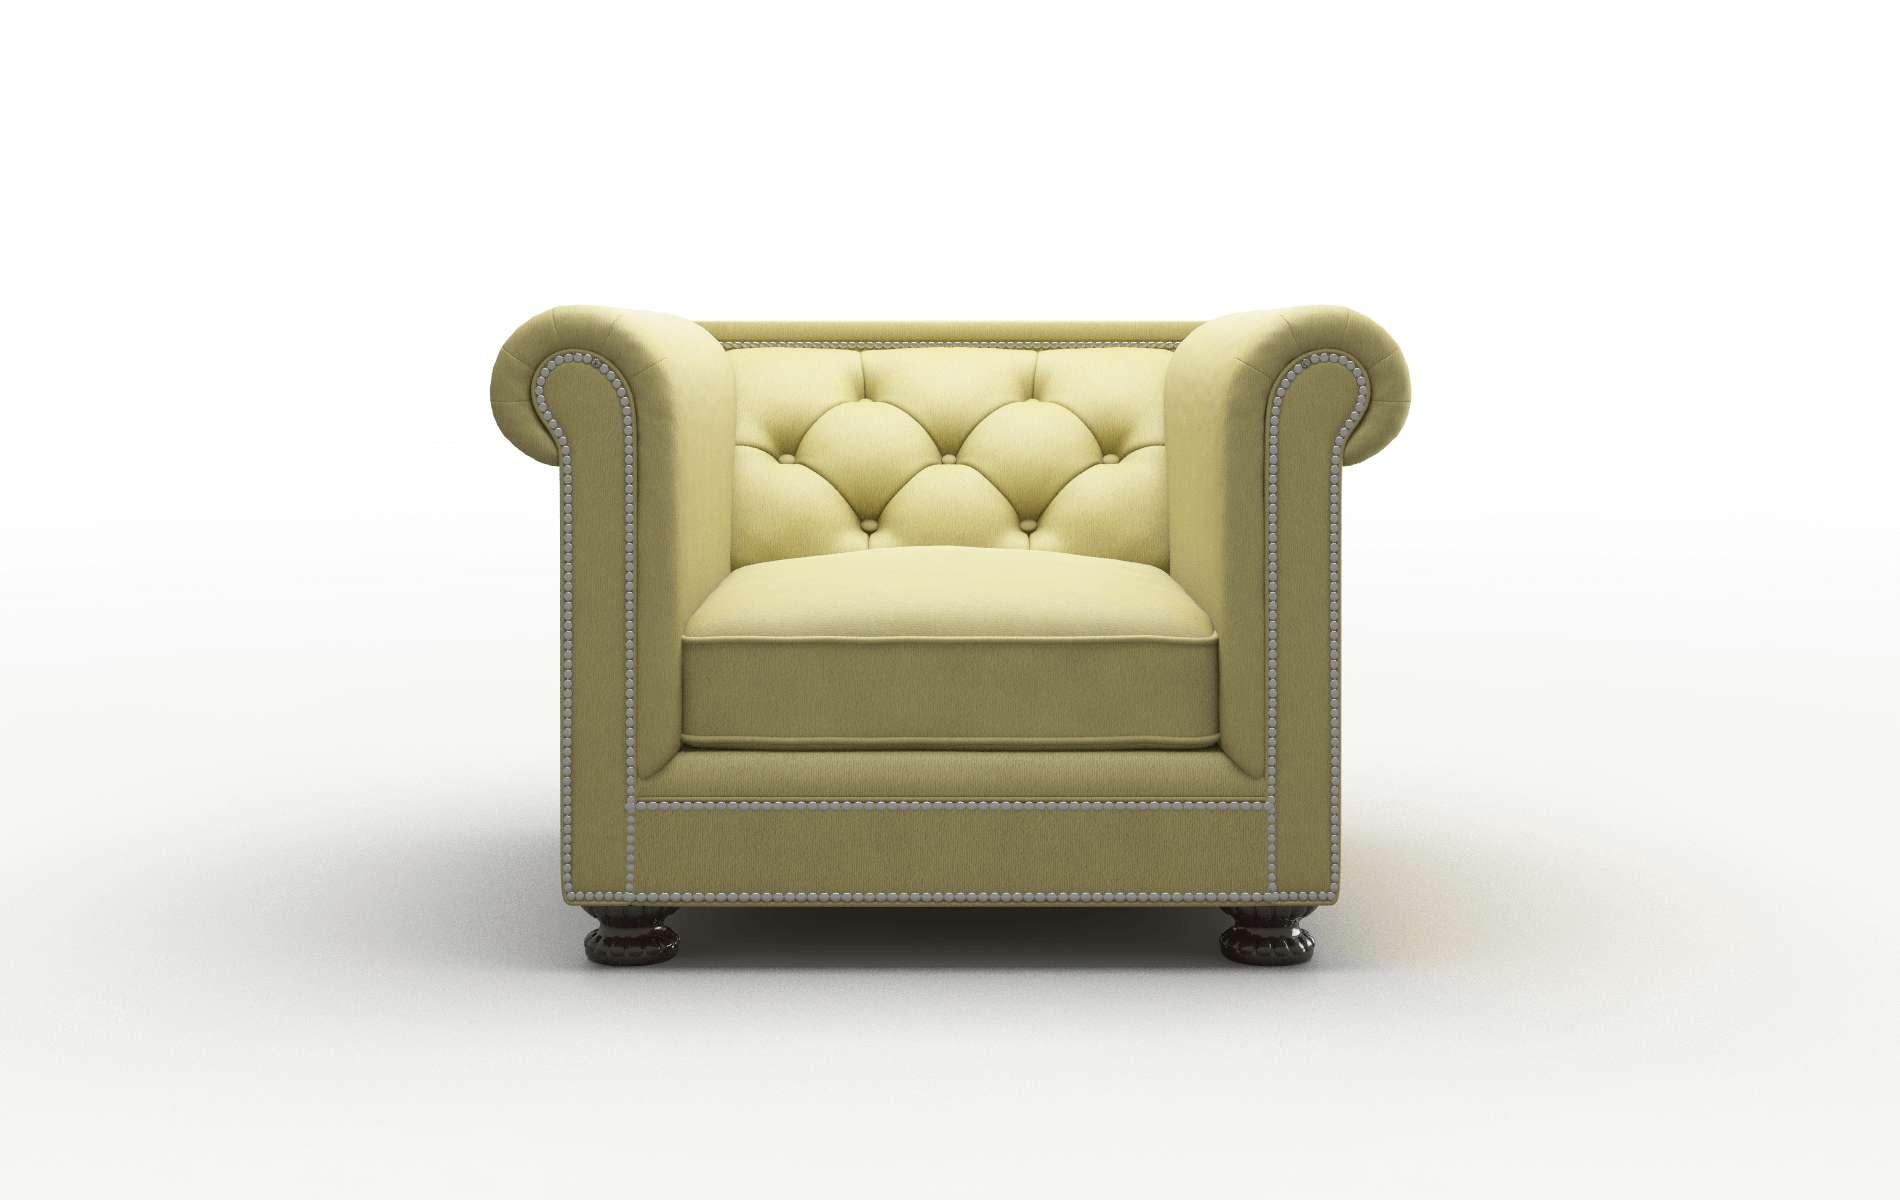 Athens Bella Apple chair espresso legs